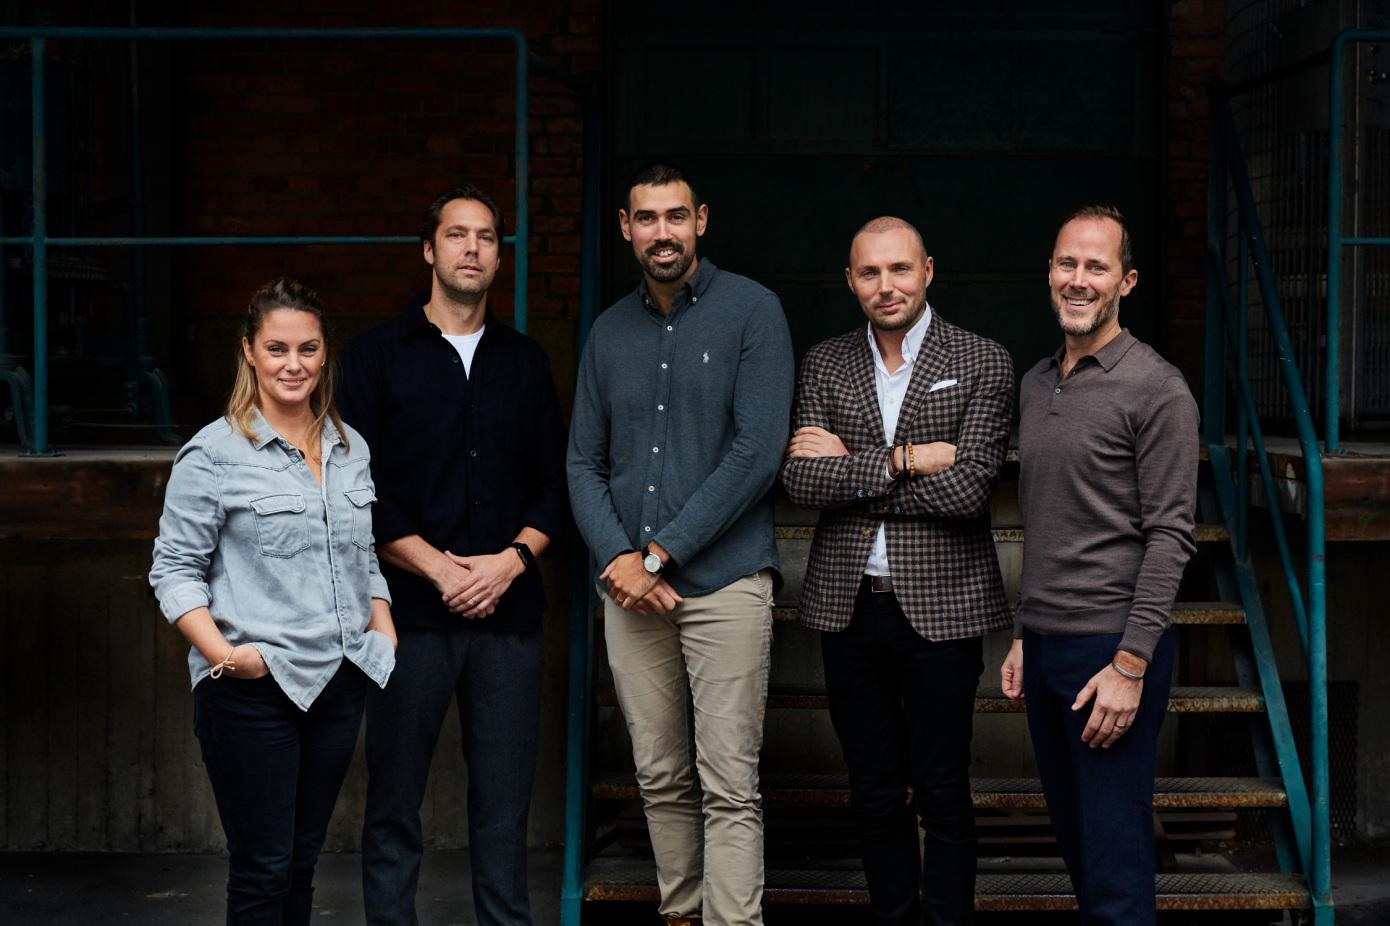 Swedish Pre-Launch Startup Juni Raises €2M From Cherry Ventures